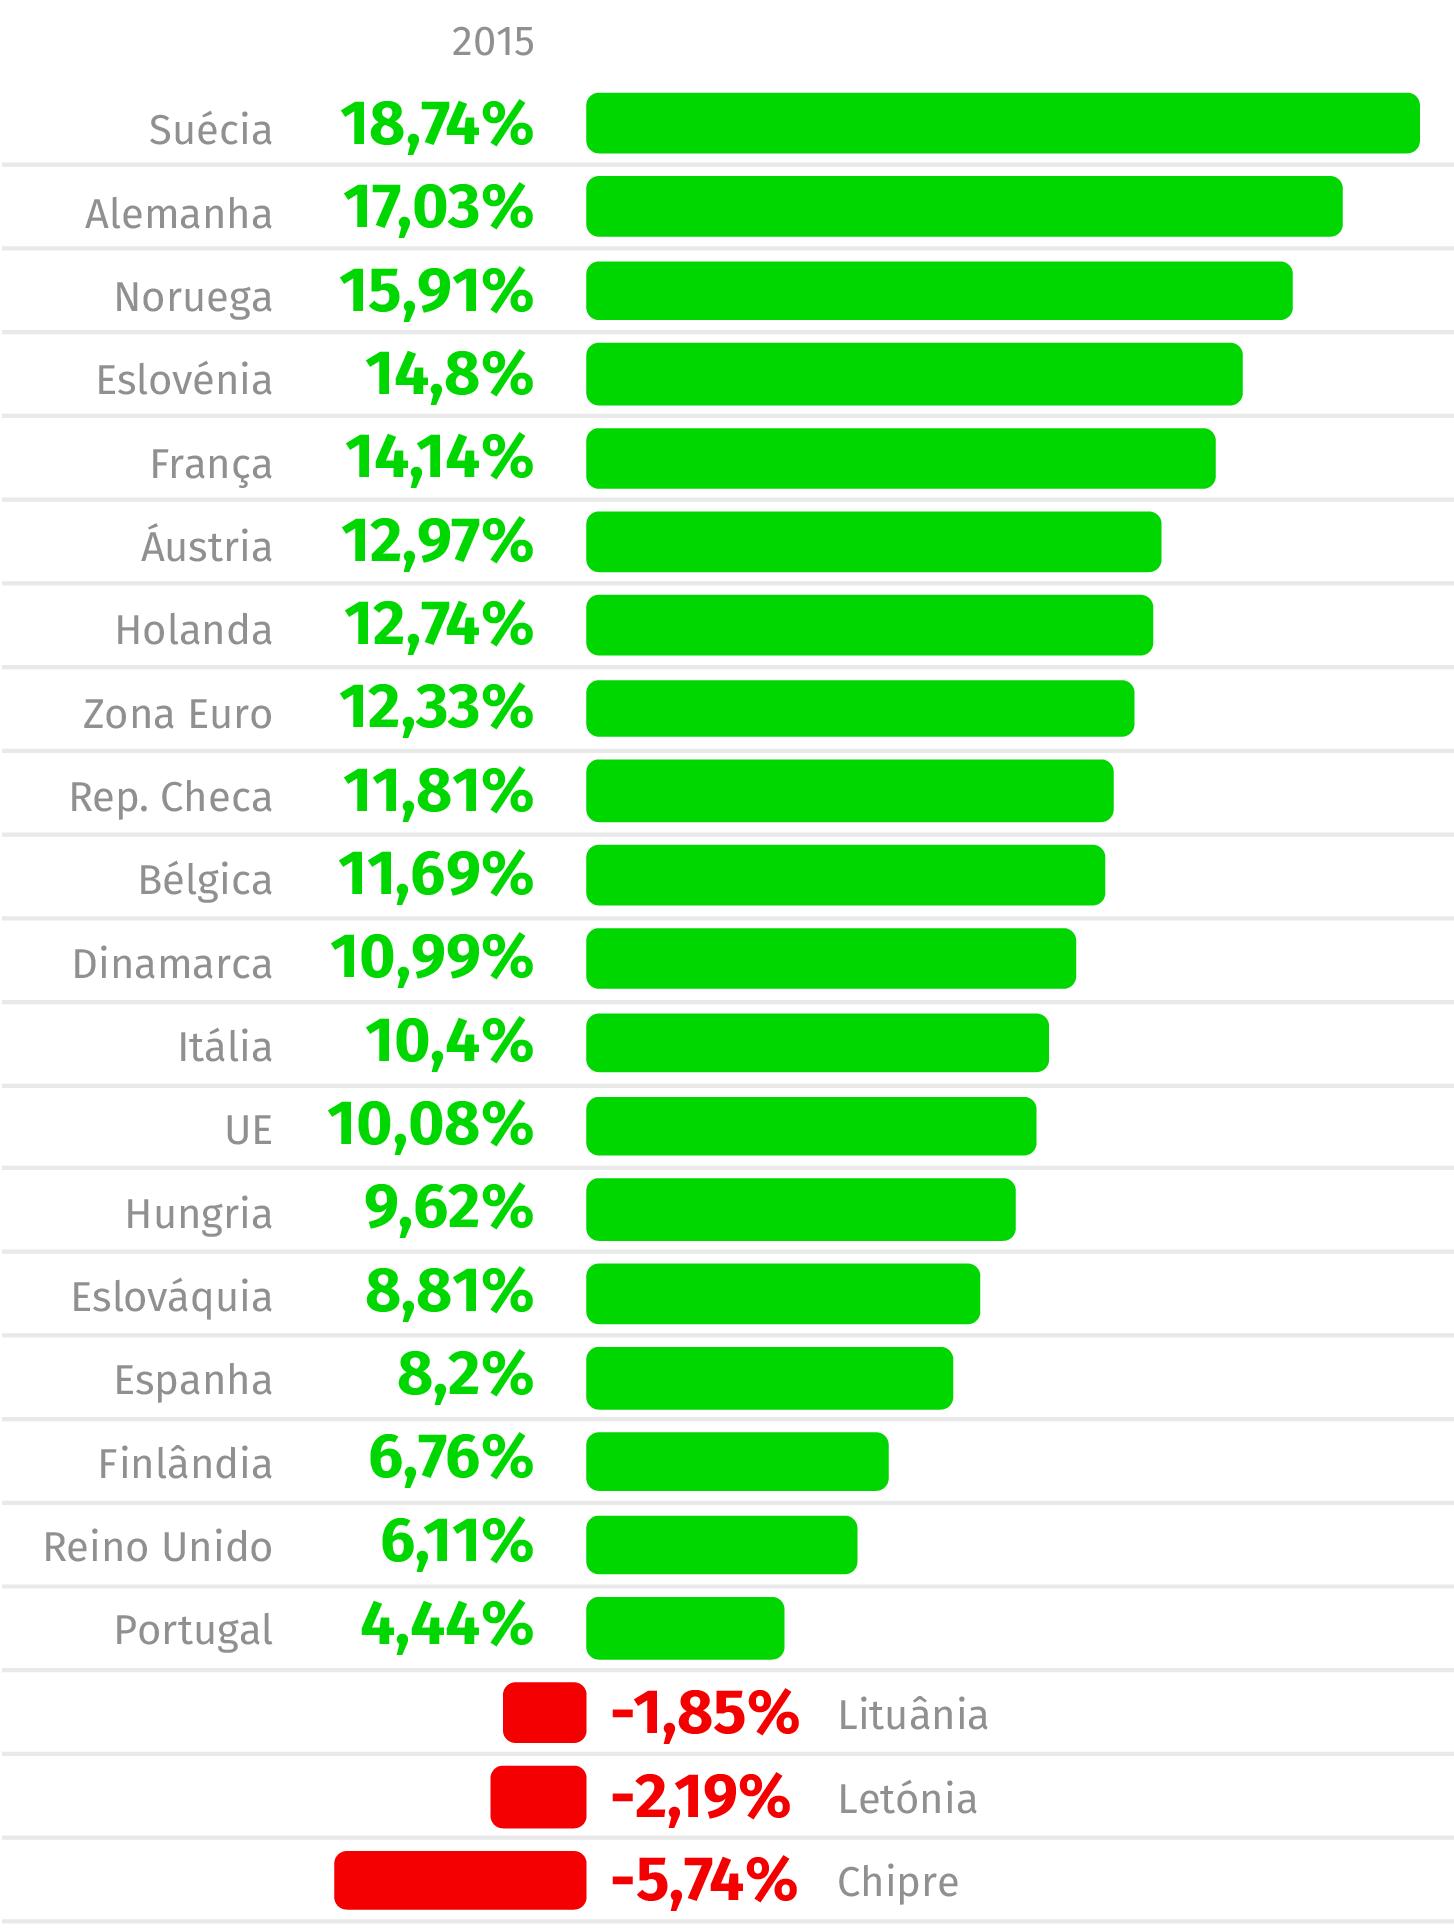 Fonte: Eurostat (Valores em percentagem)